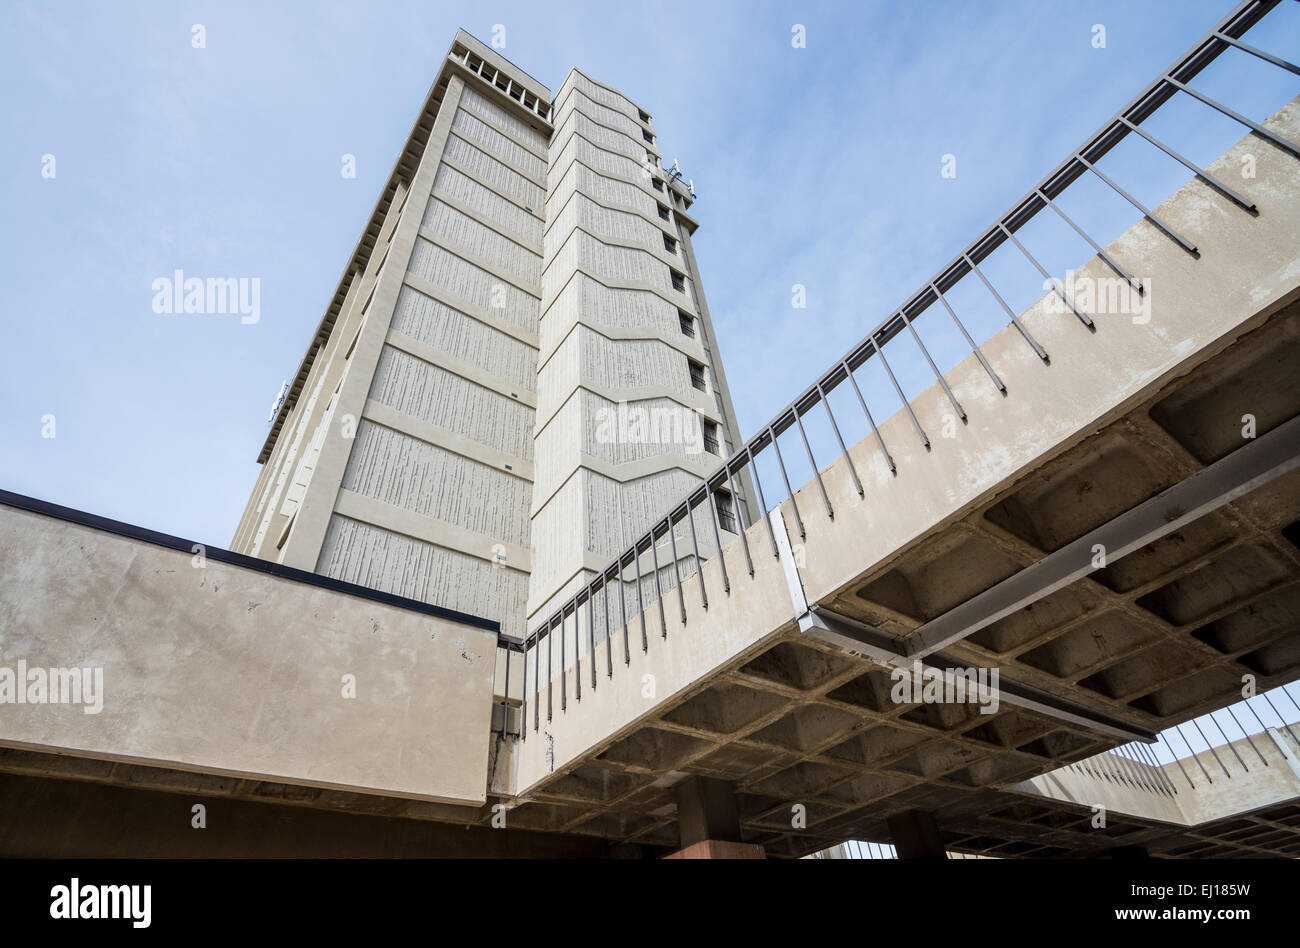 Social & Behavioral Sciences Building at the University of Utah in Salt Lake City - Stock Image